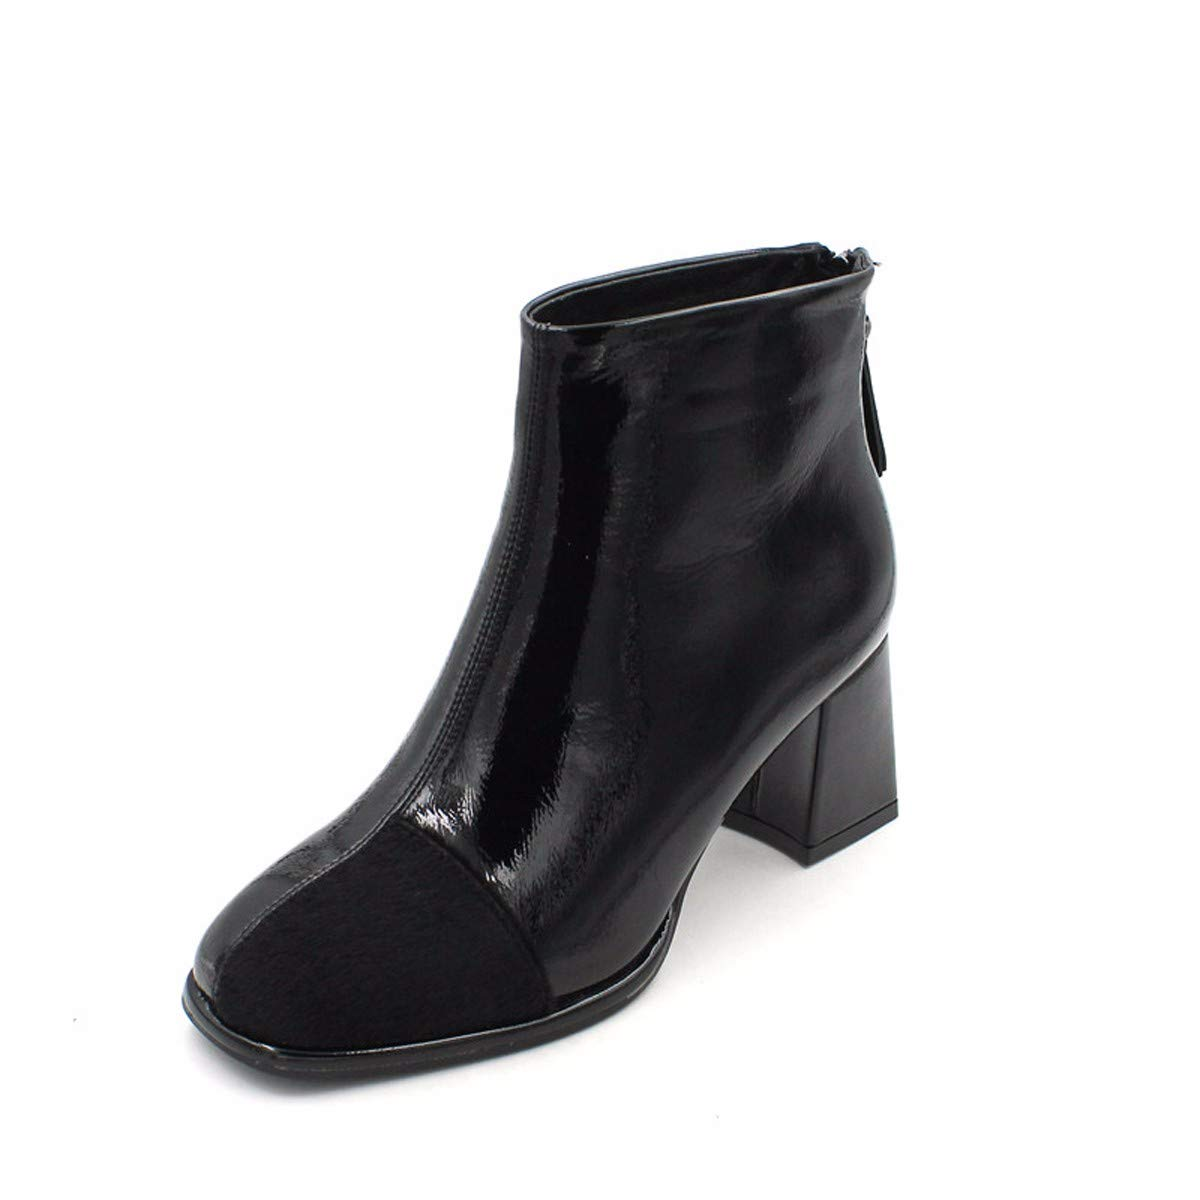 KPHY Damenschuhe Kurze Kurze Kurze Stiefel Mit Hohen 6 cm Koreanischen Version Joker Schwarz Grob Hacken. 804773